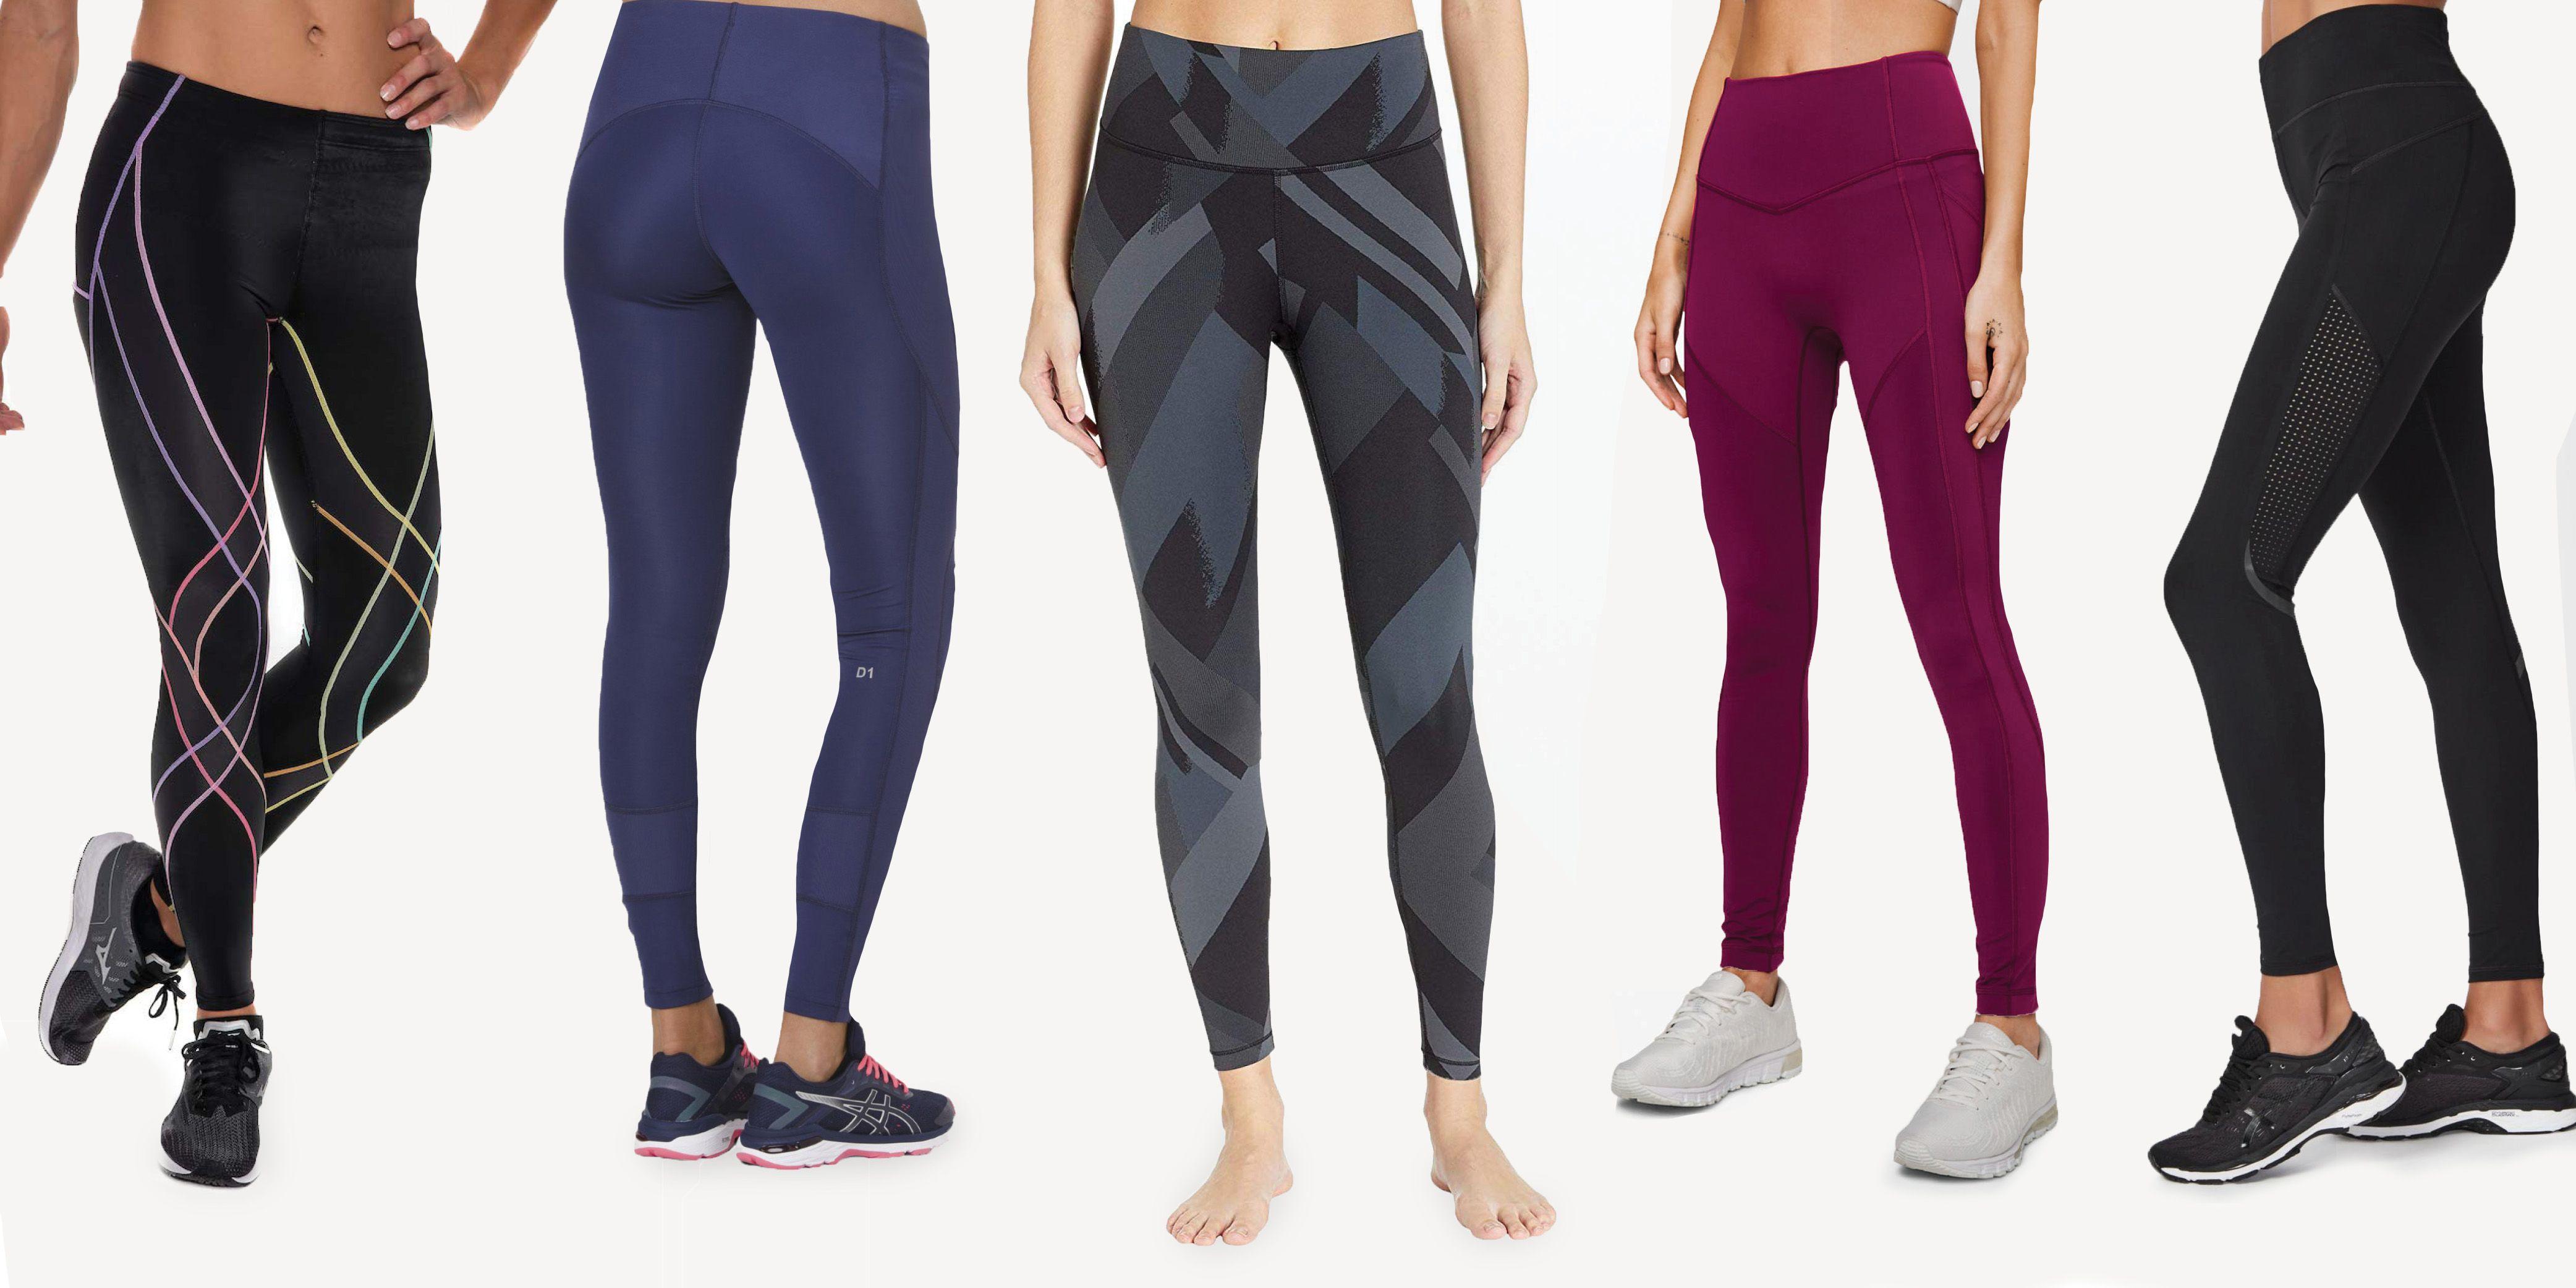 uusi korkea halpa viralliset kuvat Best Compression Leggings 2019 | Compression Tights for Runners